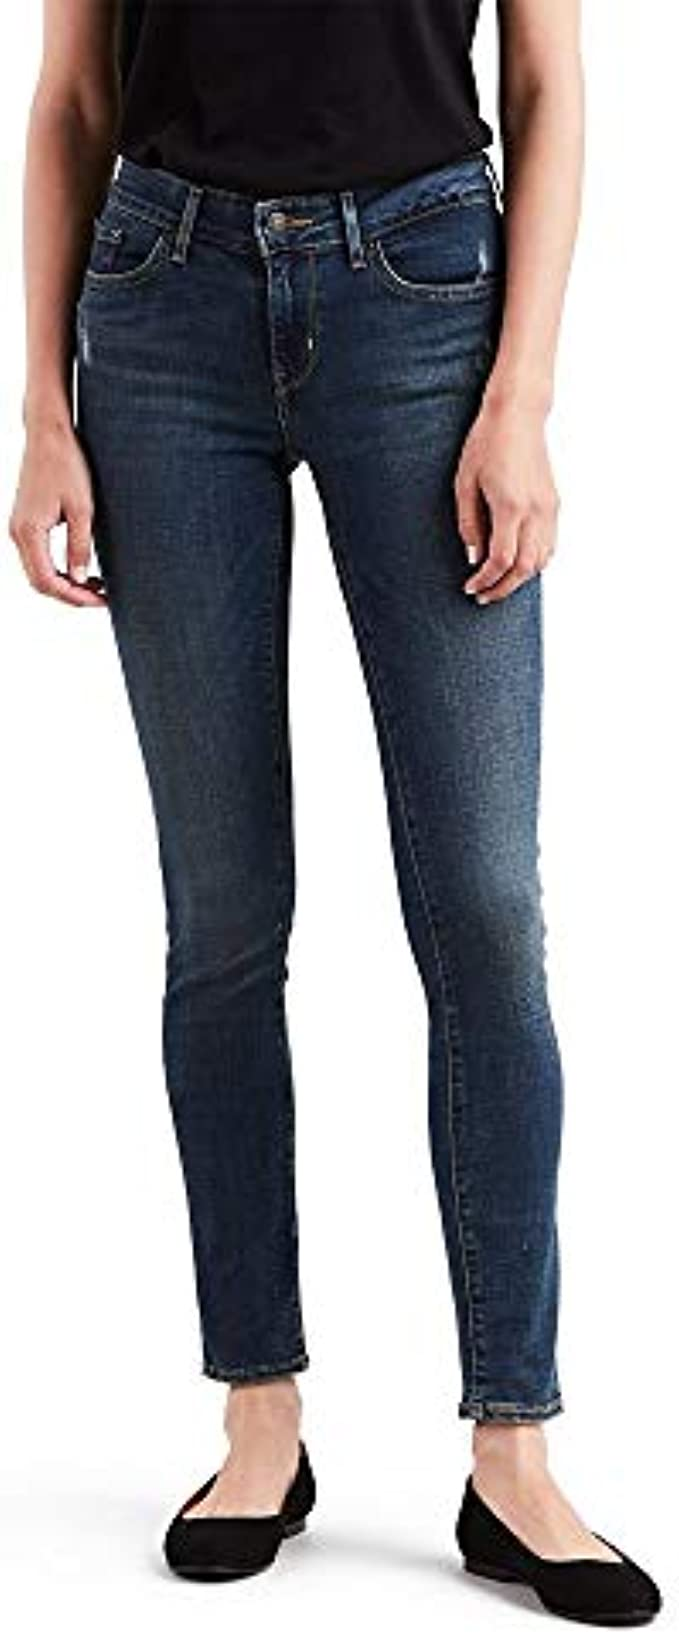 Levi's Women's 711 Skinny Jeans : Color - Indigo Rays, Size - 29 Regular (B07114K1L8)